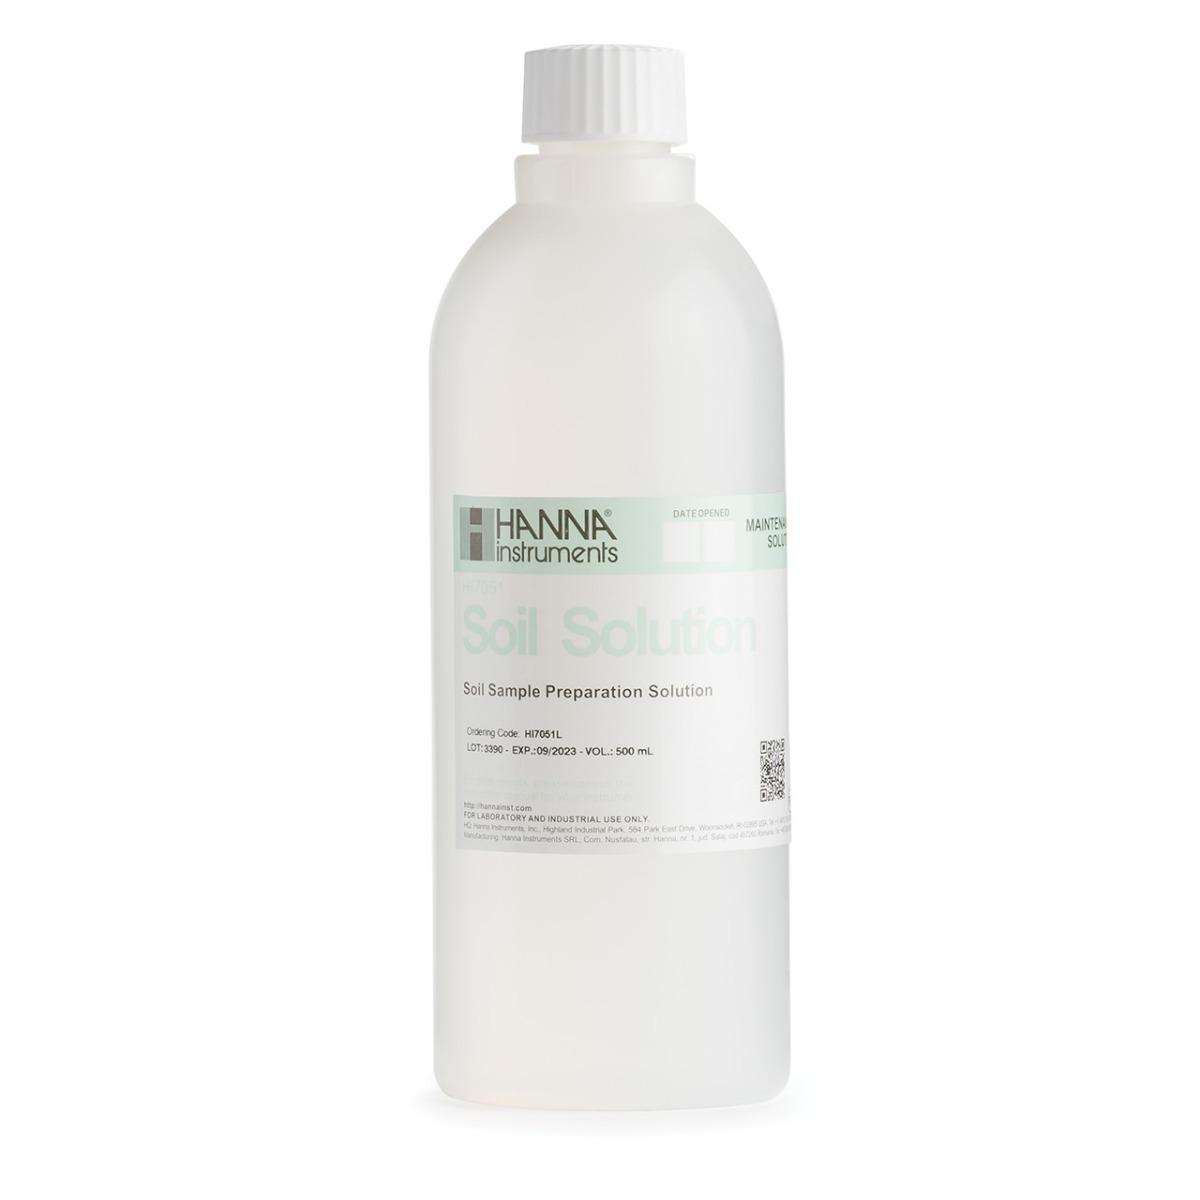 HI7051L Soil Sample Preparation Solution (500 mL)